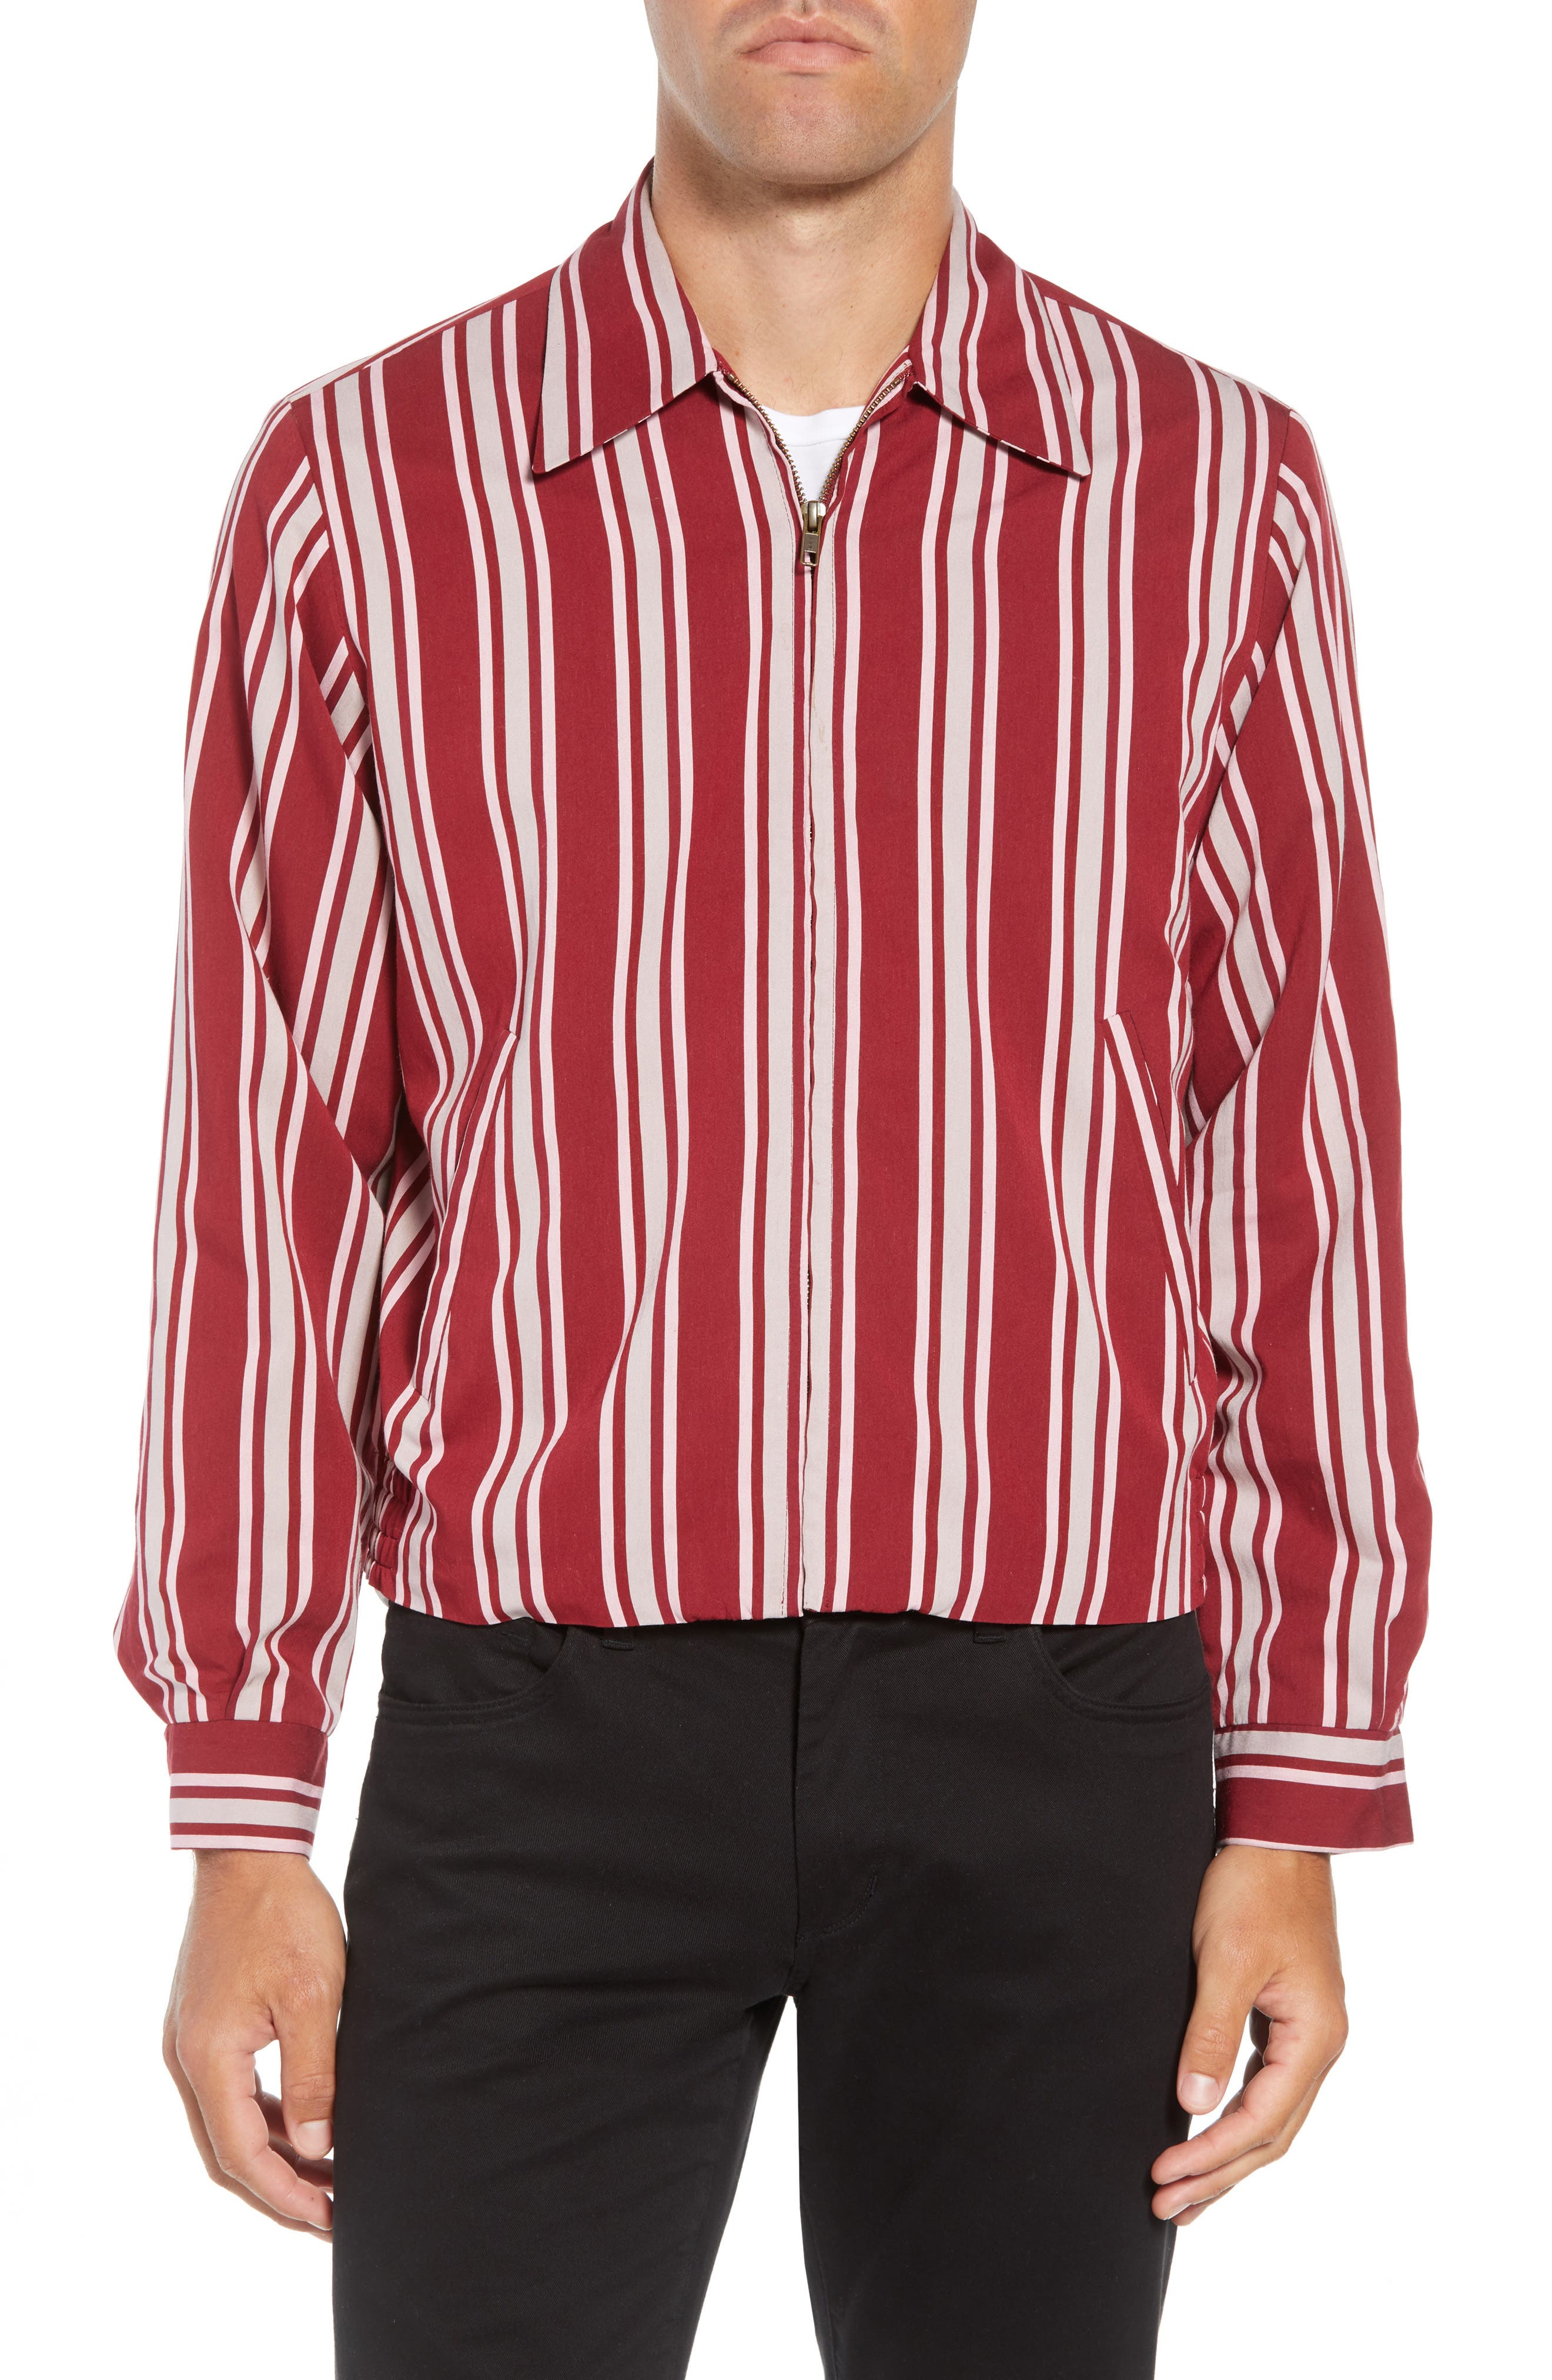 Fifty Regular Fit Shirt Jacket,                             Alternate thumbnail 4, color,                             RED STRIPE